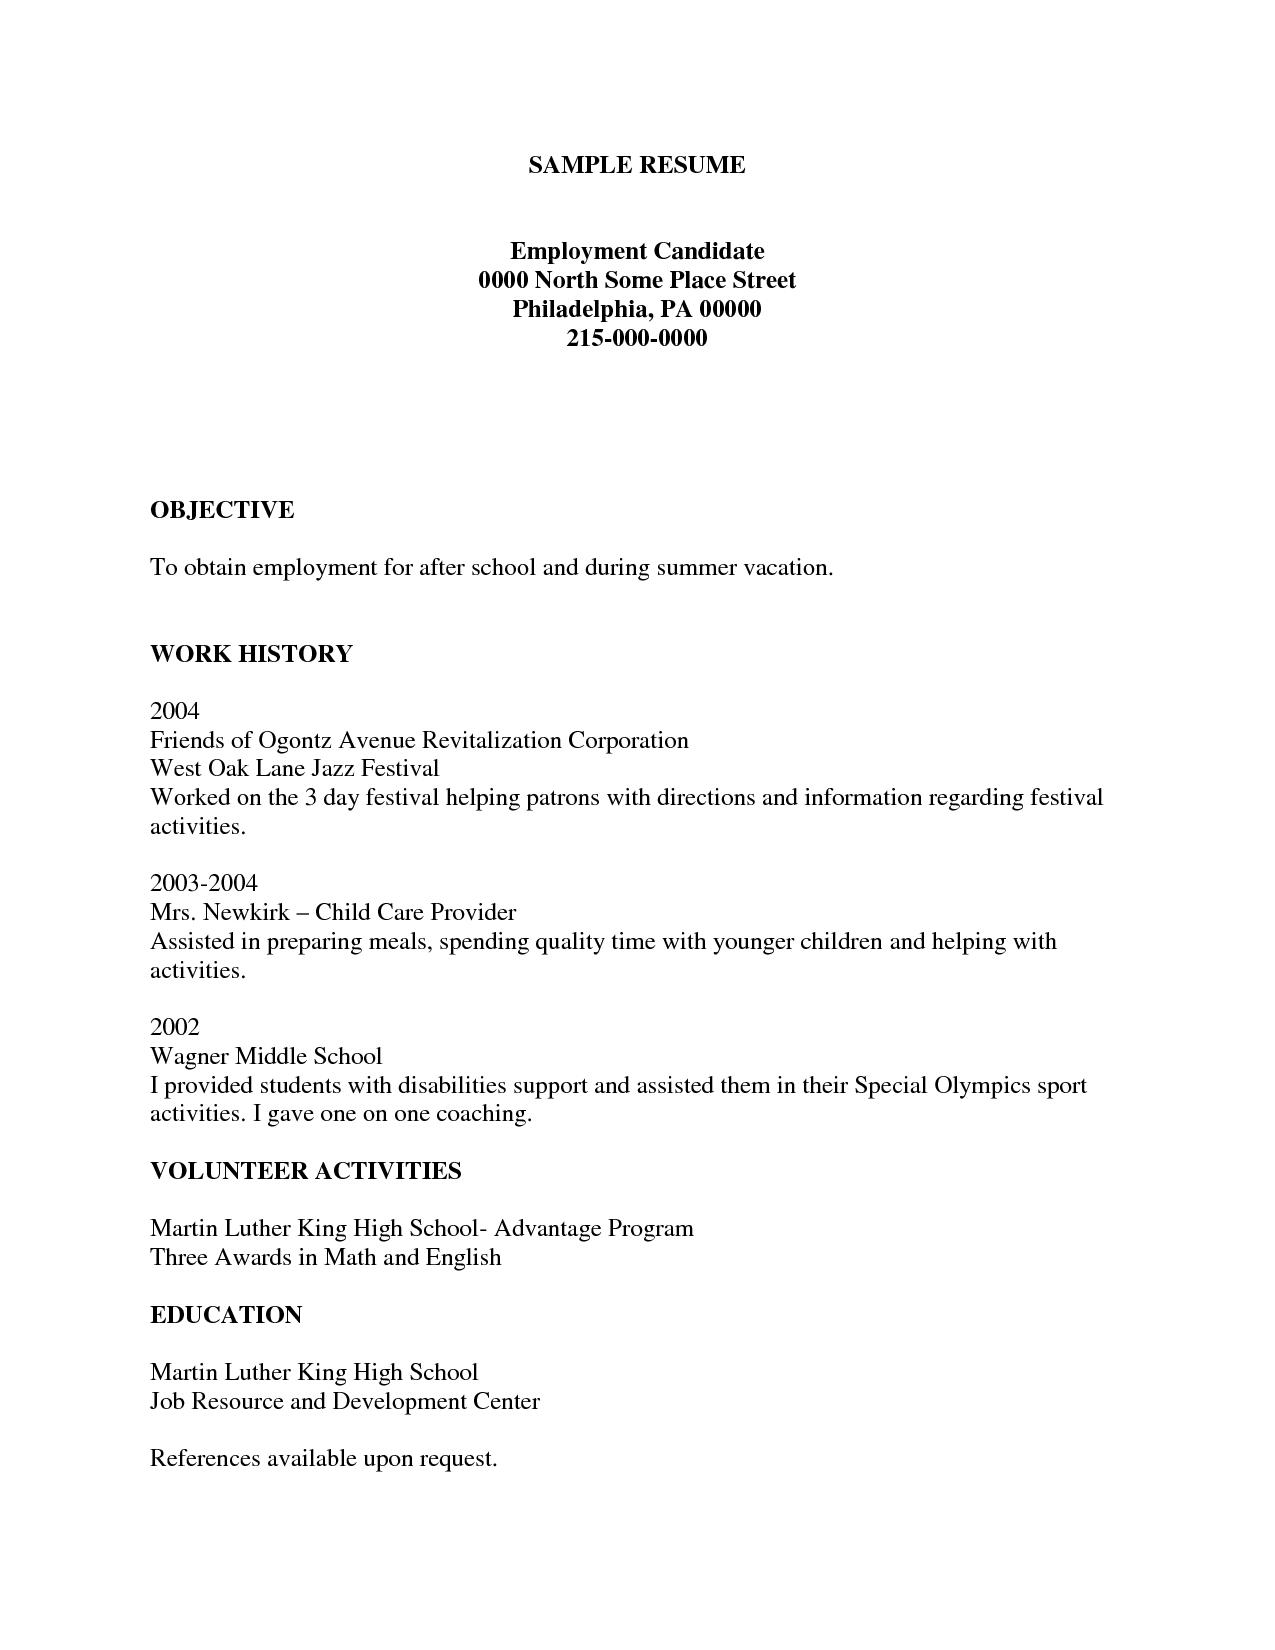 Create A Free Printable Resume   Resume Template Info - Free Printable Resume